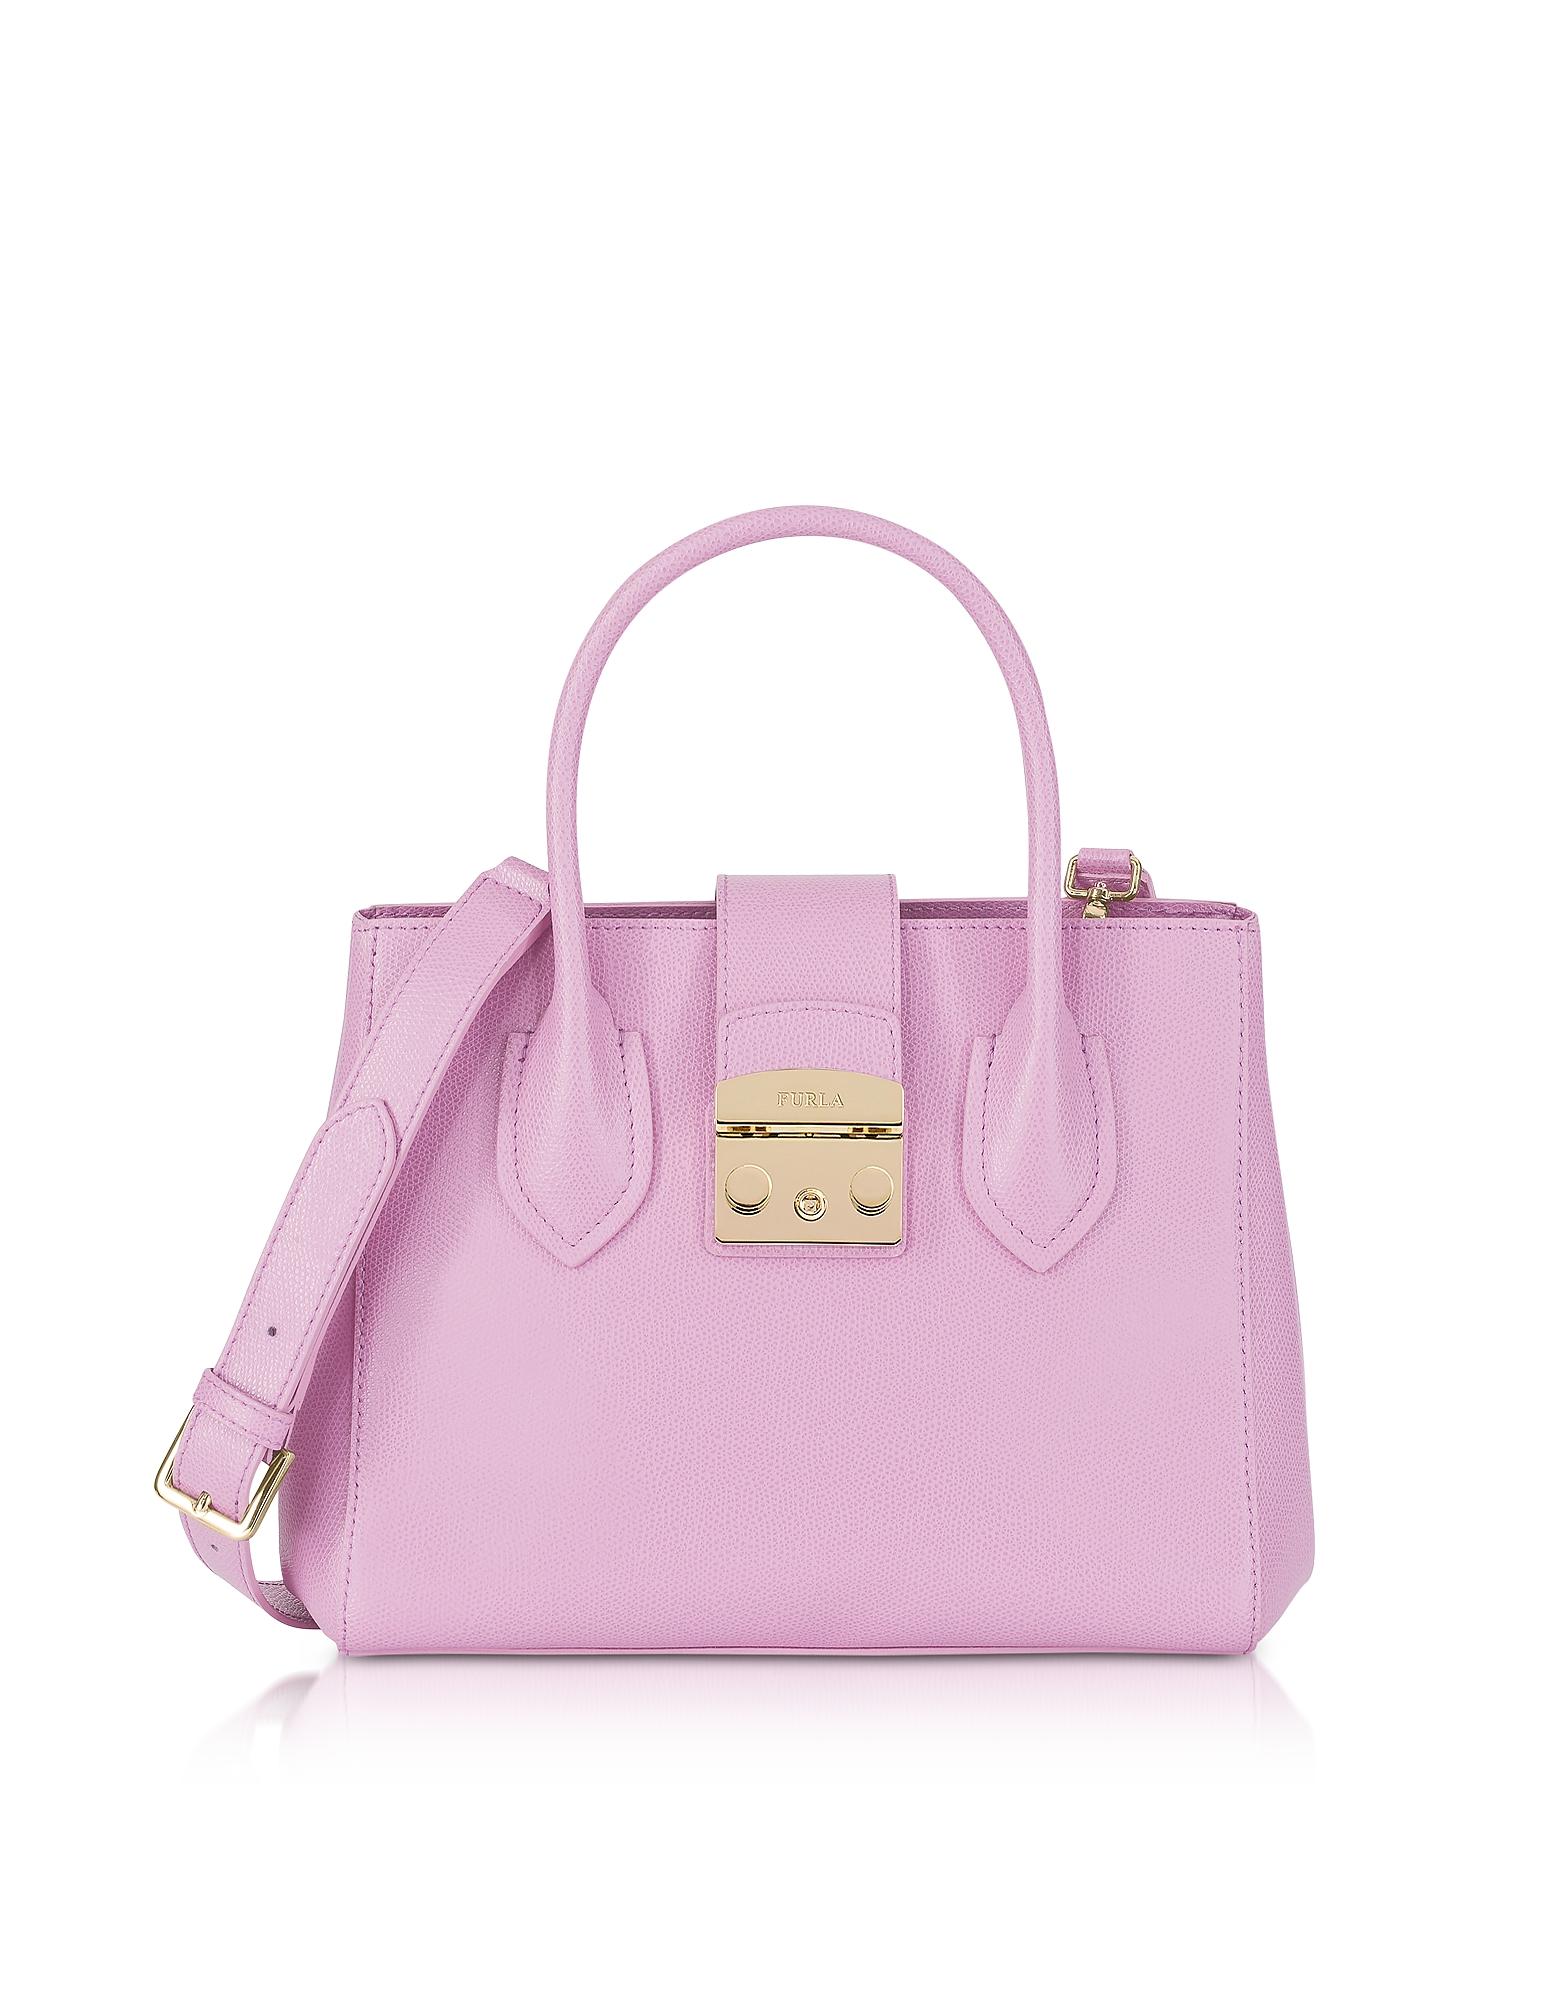 Furla Handbags, Glicine Leather Metropolis Small Tote Bag